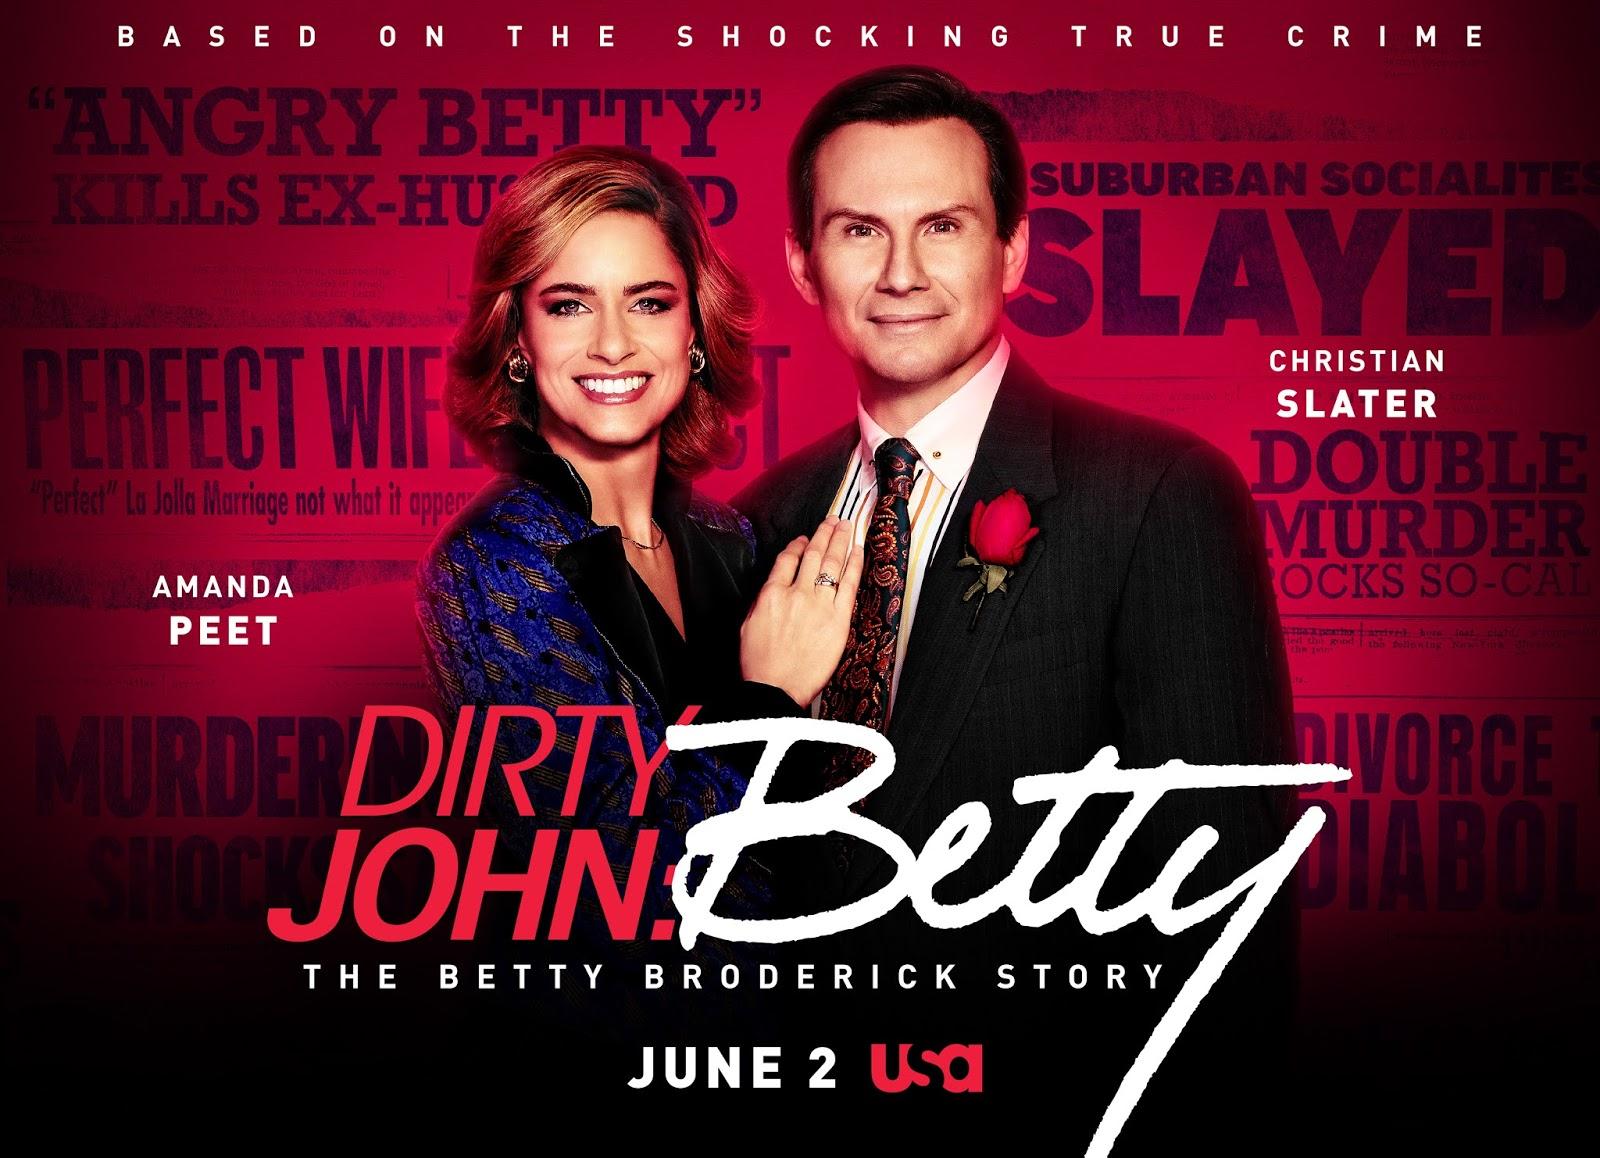 8 912 Prision Porn Moviles dirty john - episode 2.01 - 2.02 - press release + season 2